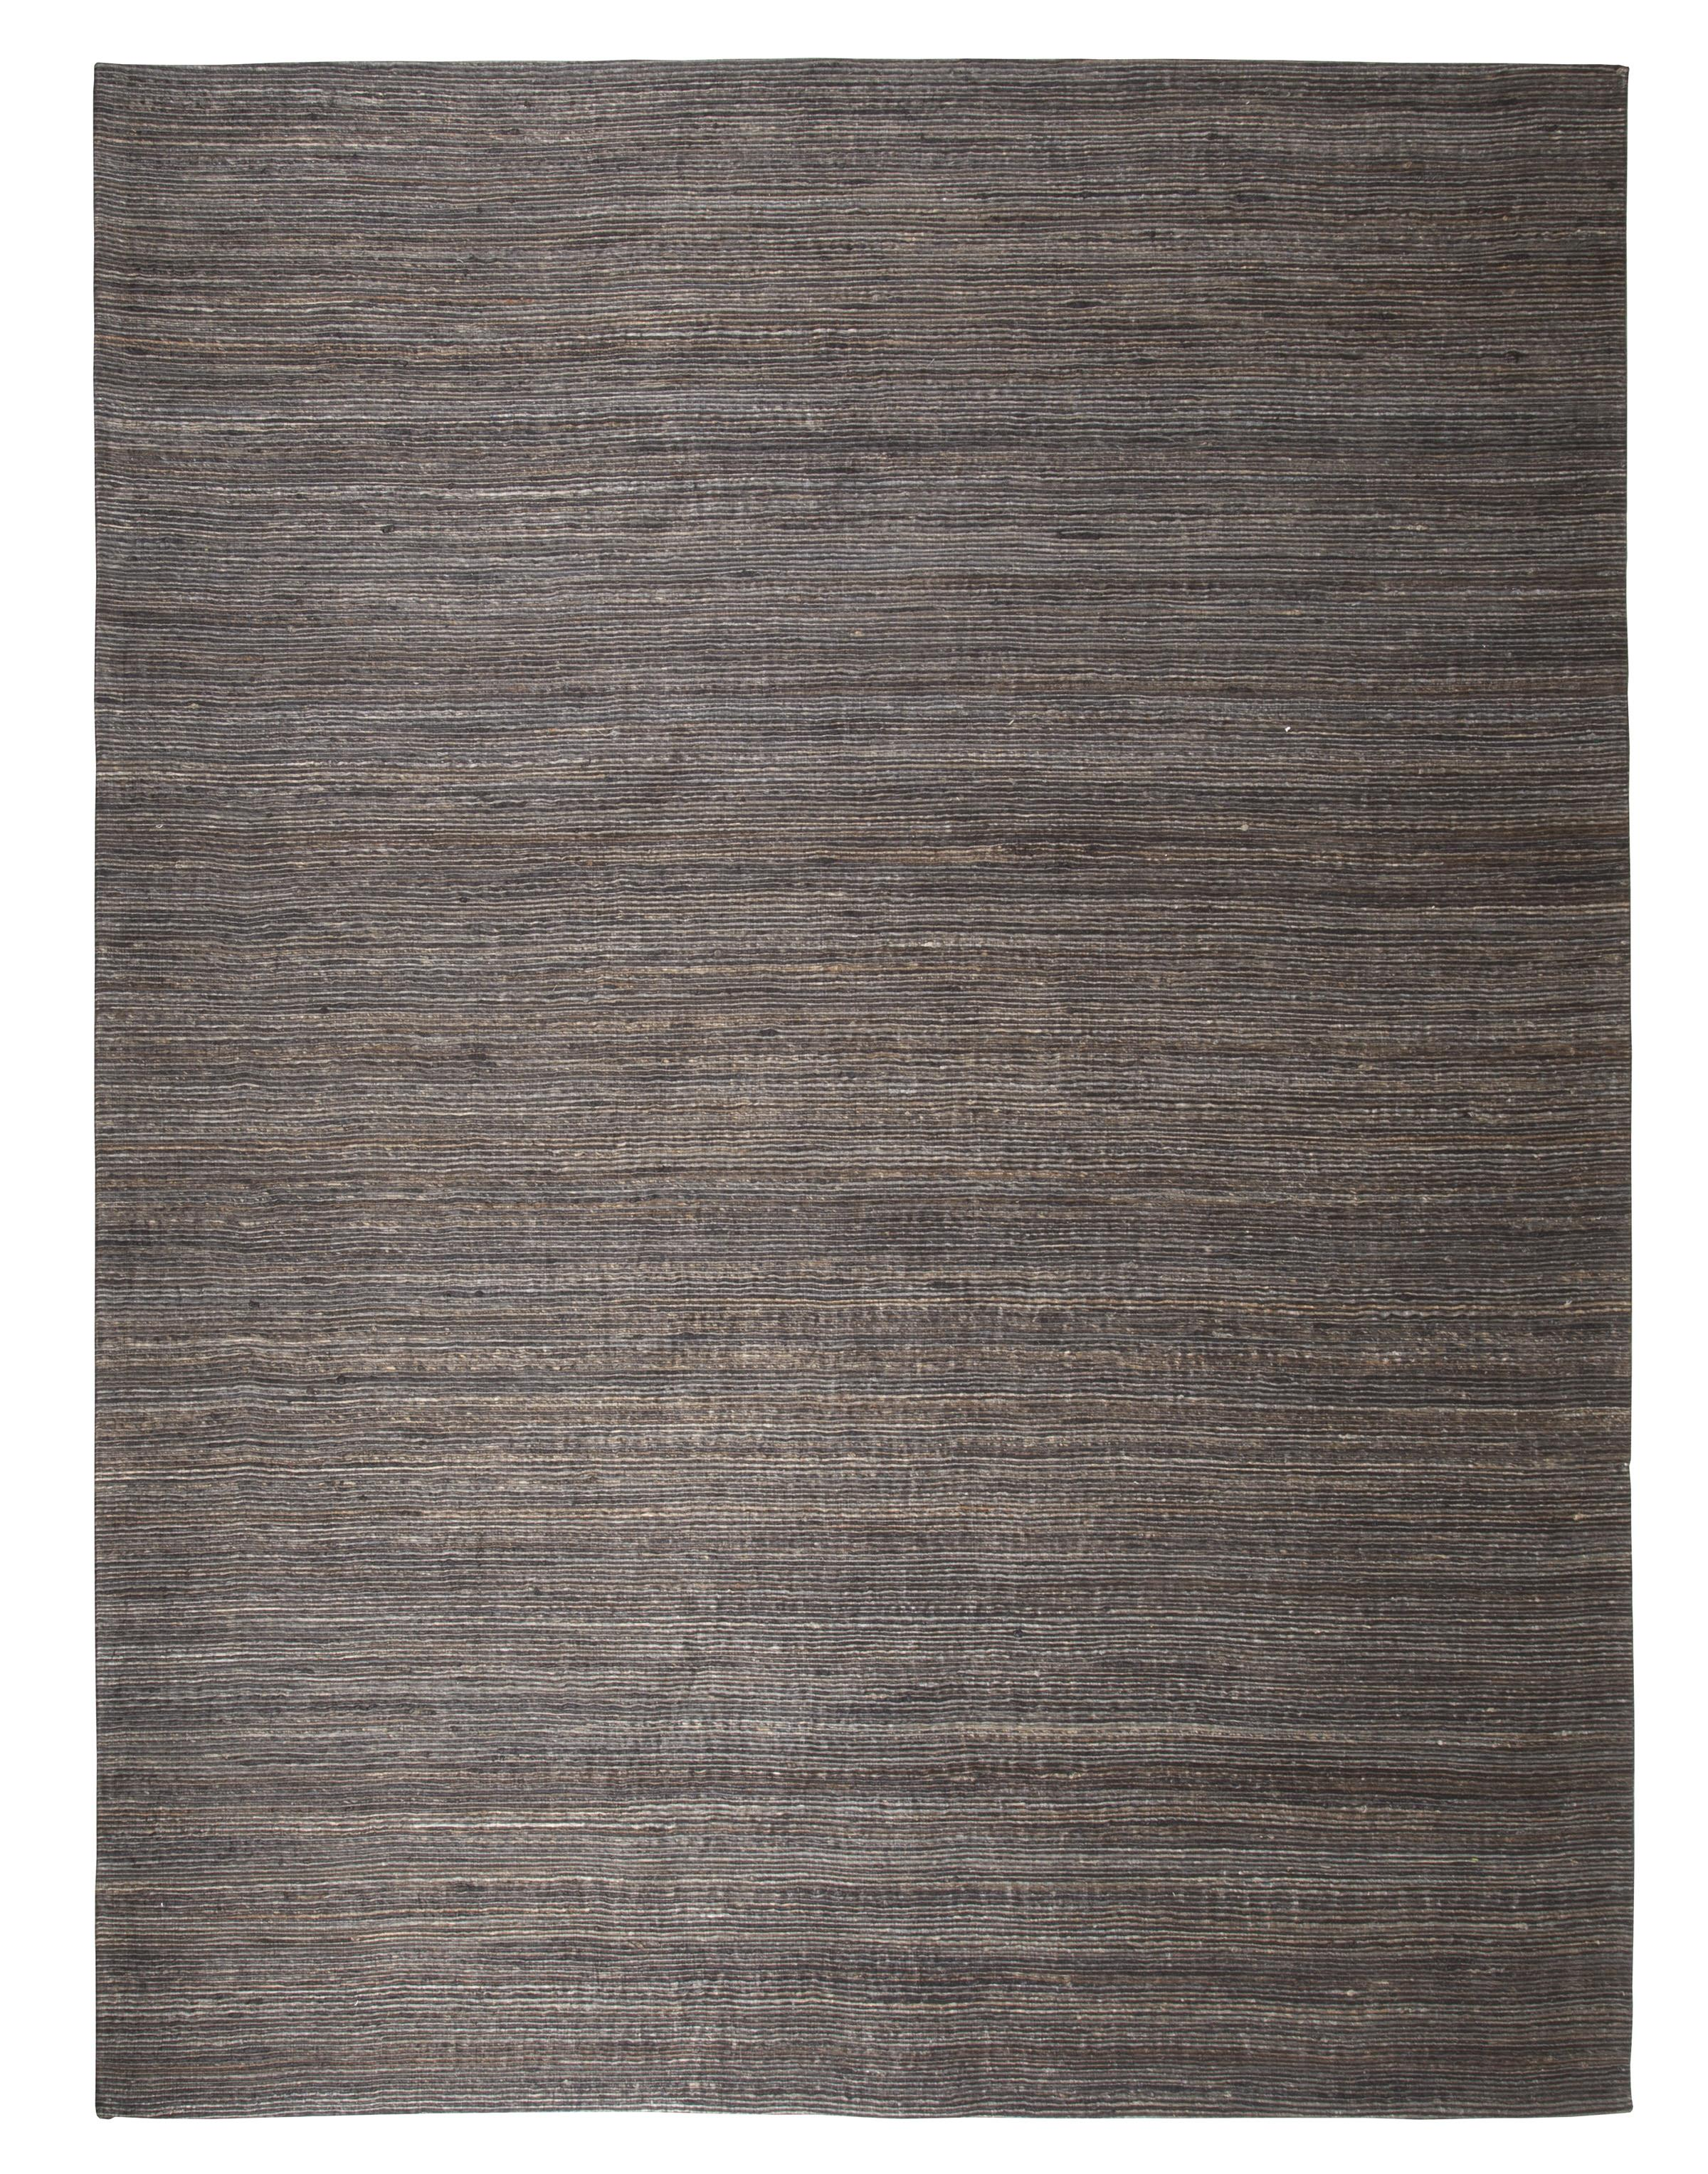 Signature Design by Ashley Contemporary Area Rugs Handwoven - Dark Gray Medium Rug - Item Number: R401412